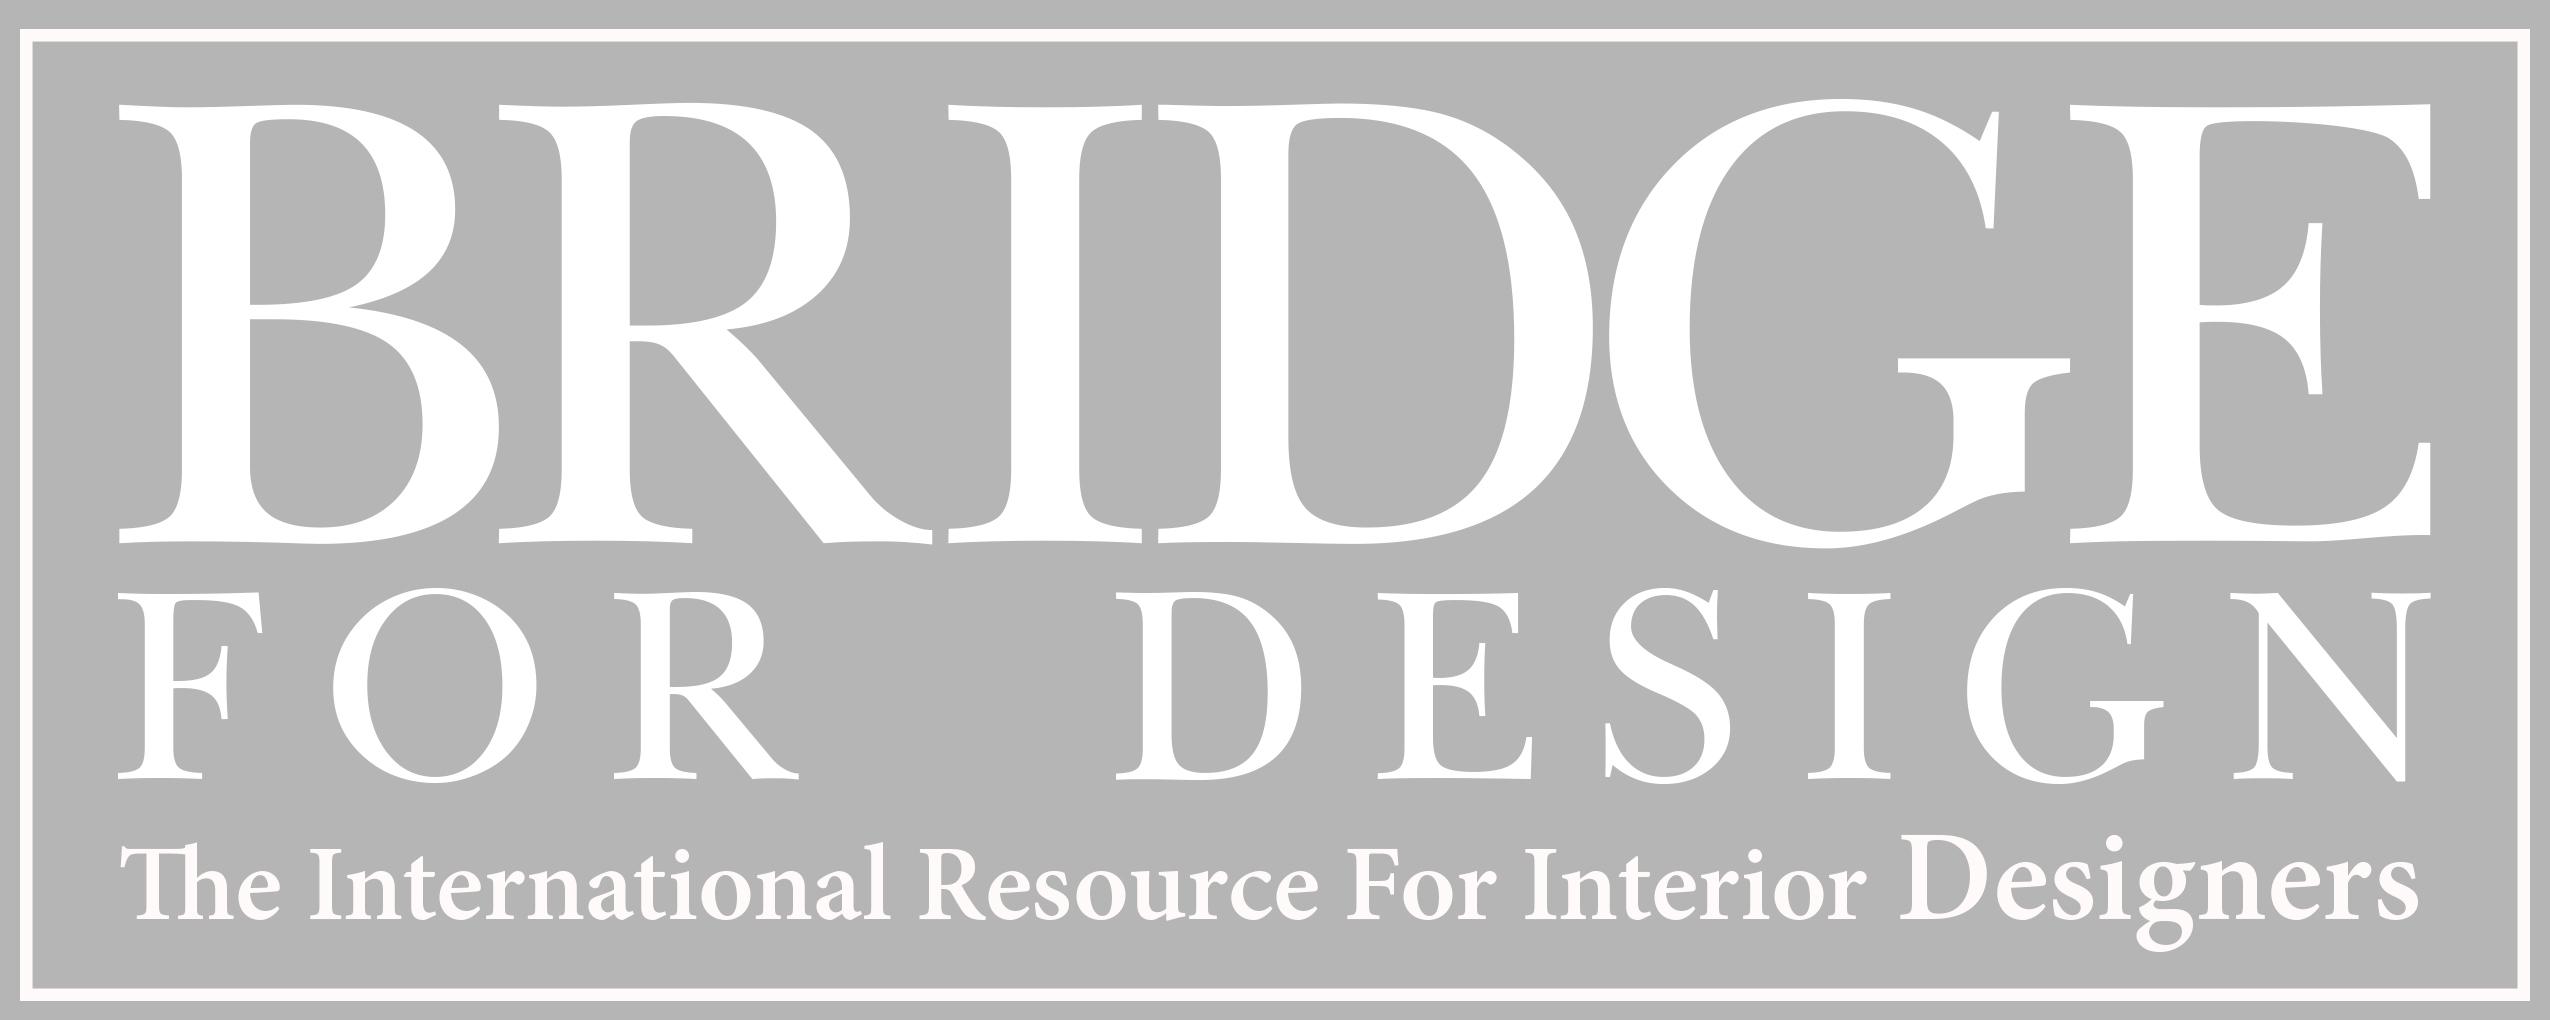 Homepage Idge4design